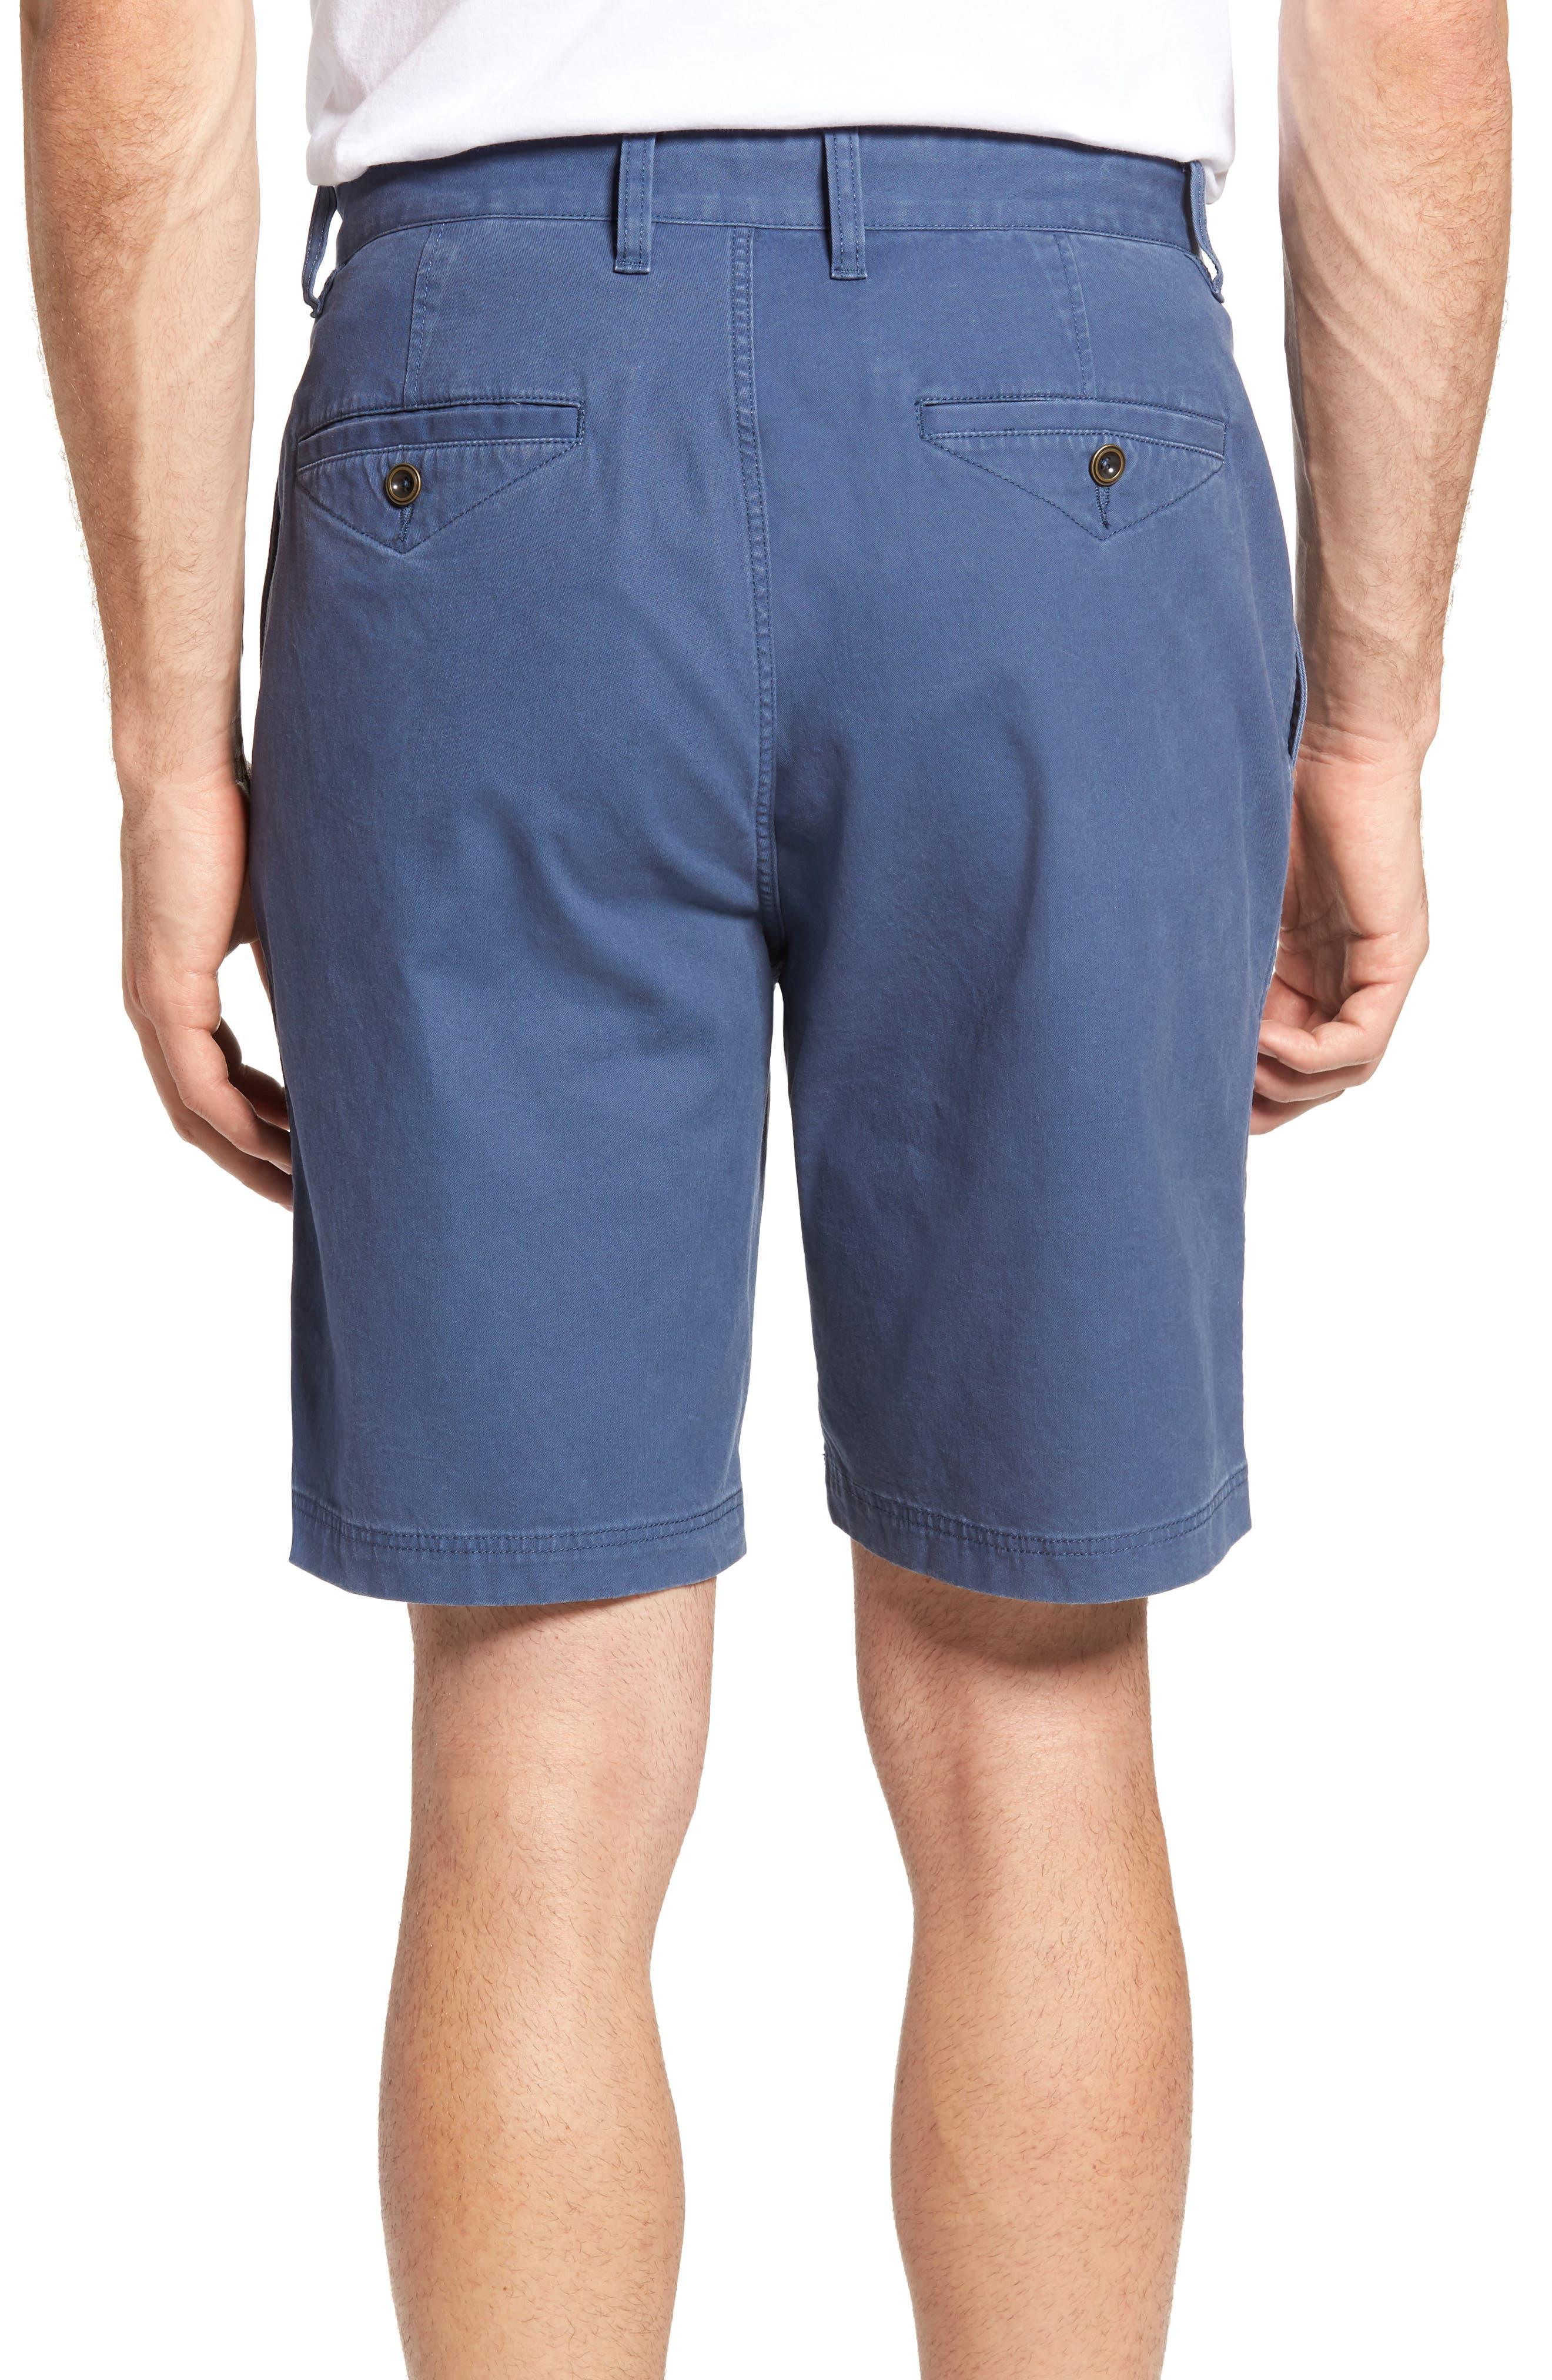 Glenburn Shorts,                             Alternate thumbnail 2, color,                             Indigo